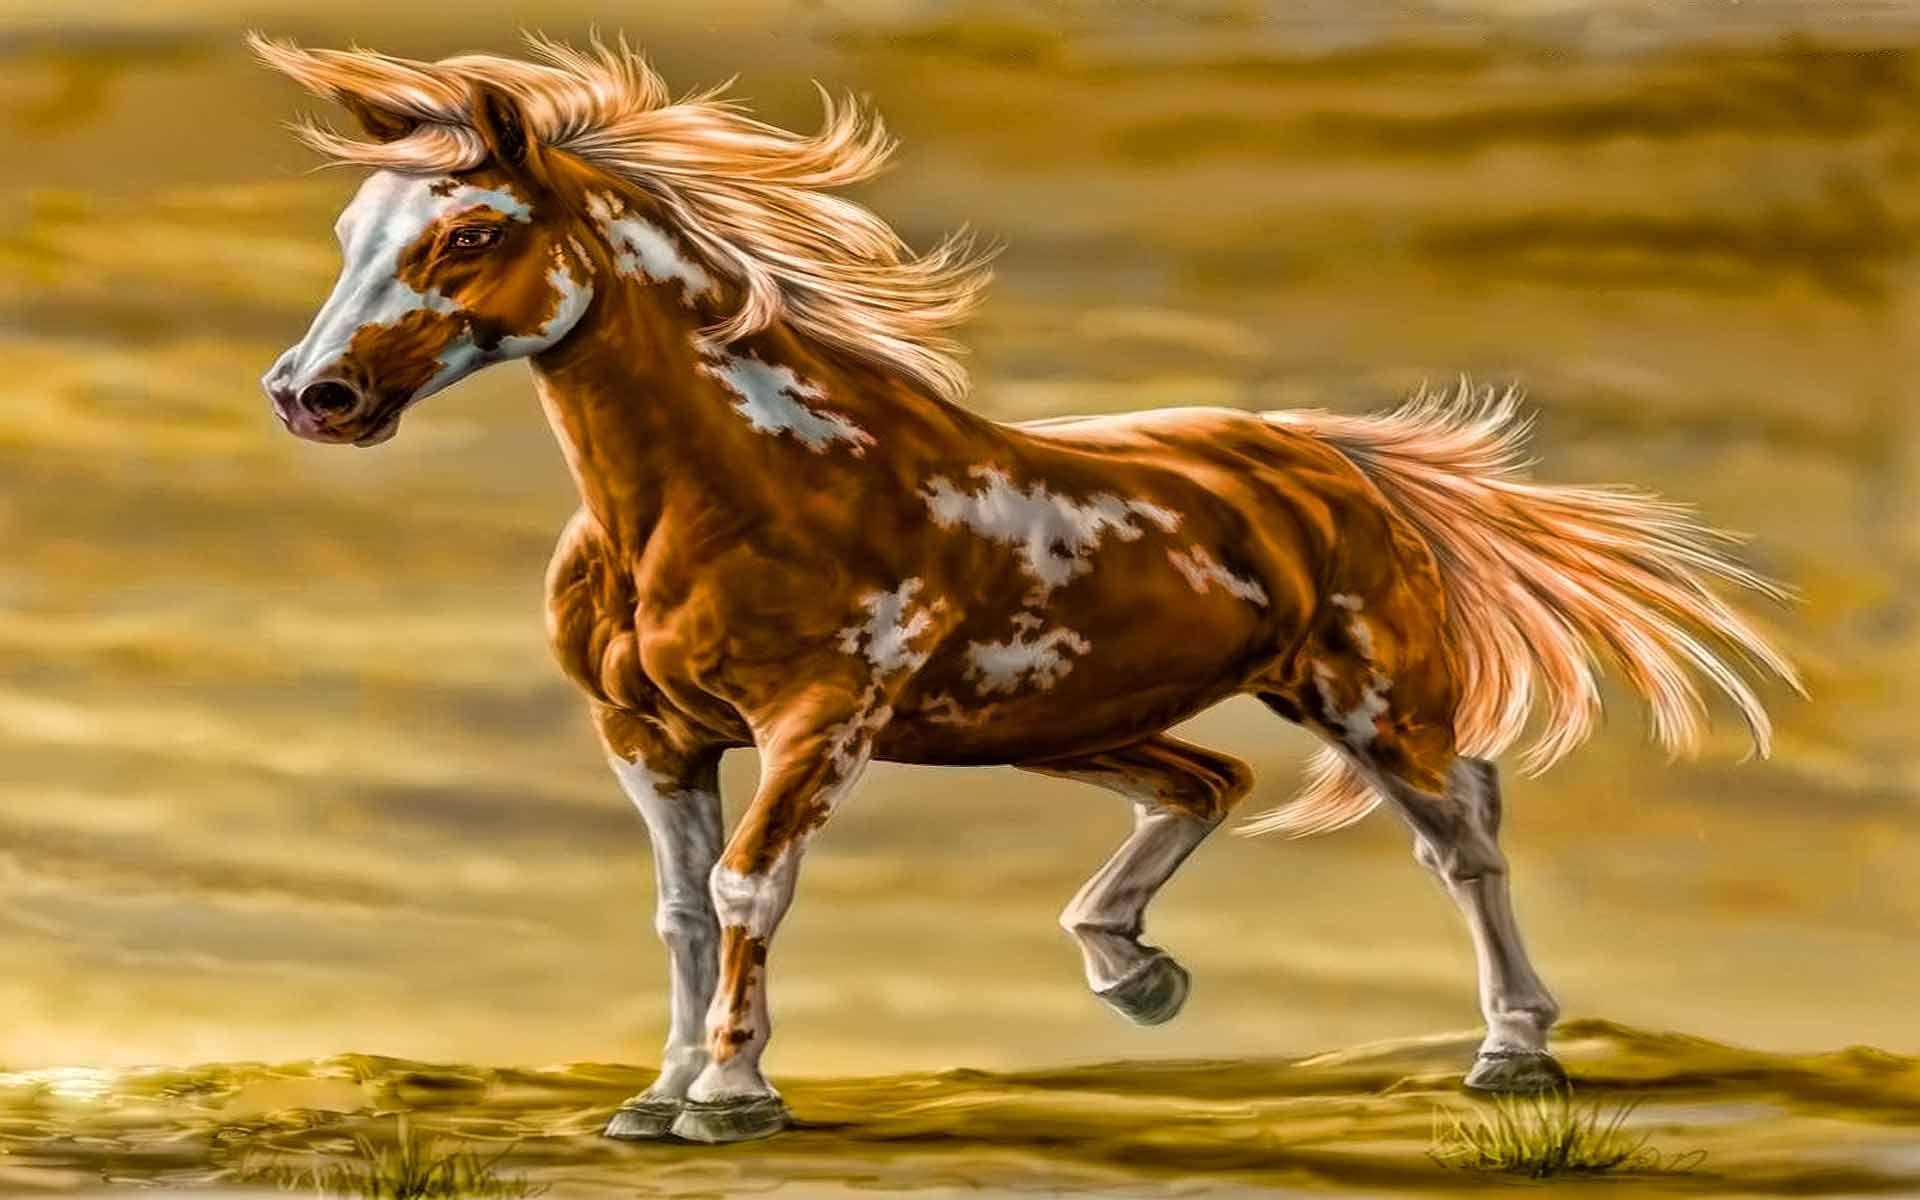 Paint Horse Wallpapers Http Wallpaperzoo Com Paint Horse Wallpapers 28543 Html Horse Painting Horses Horse Wallpaper